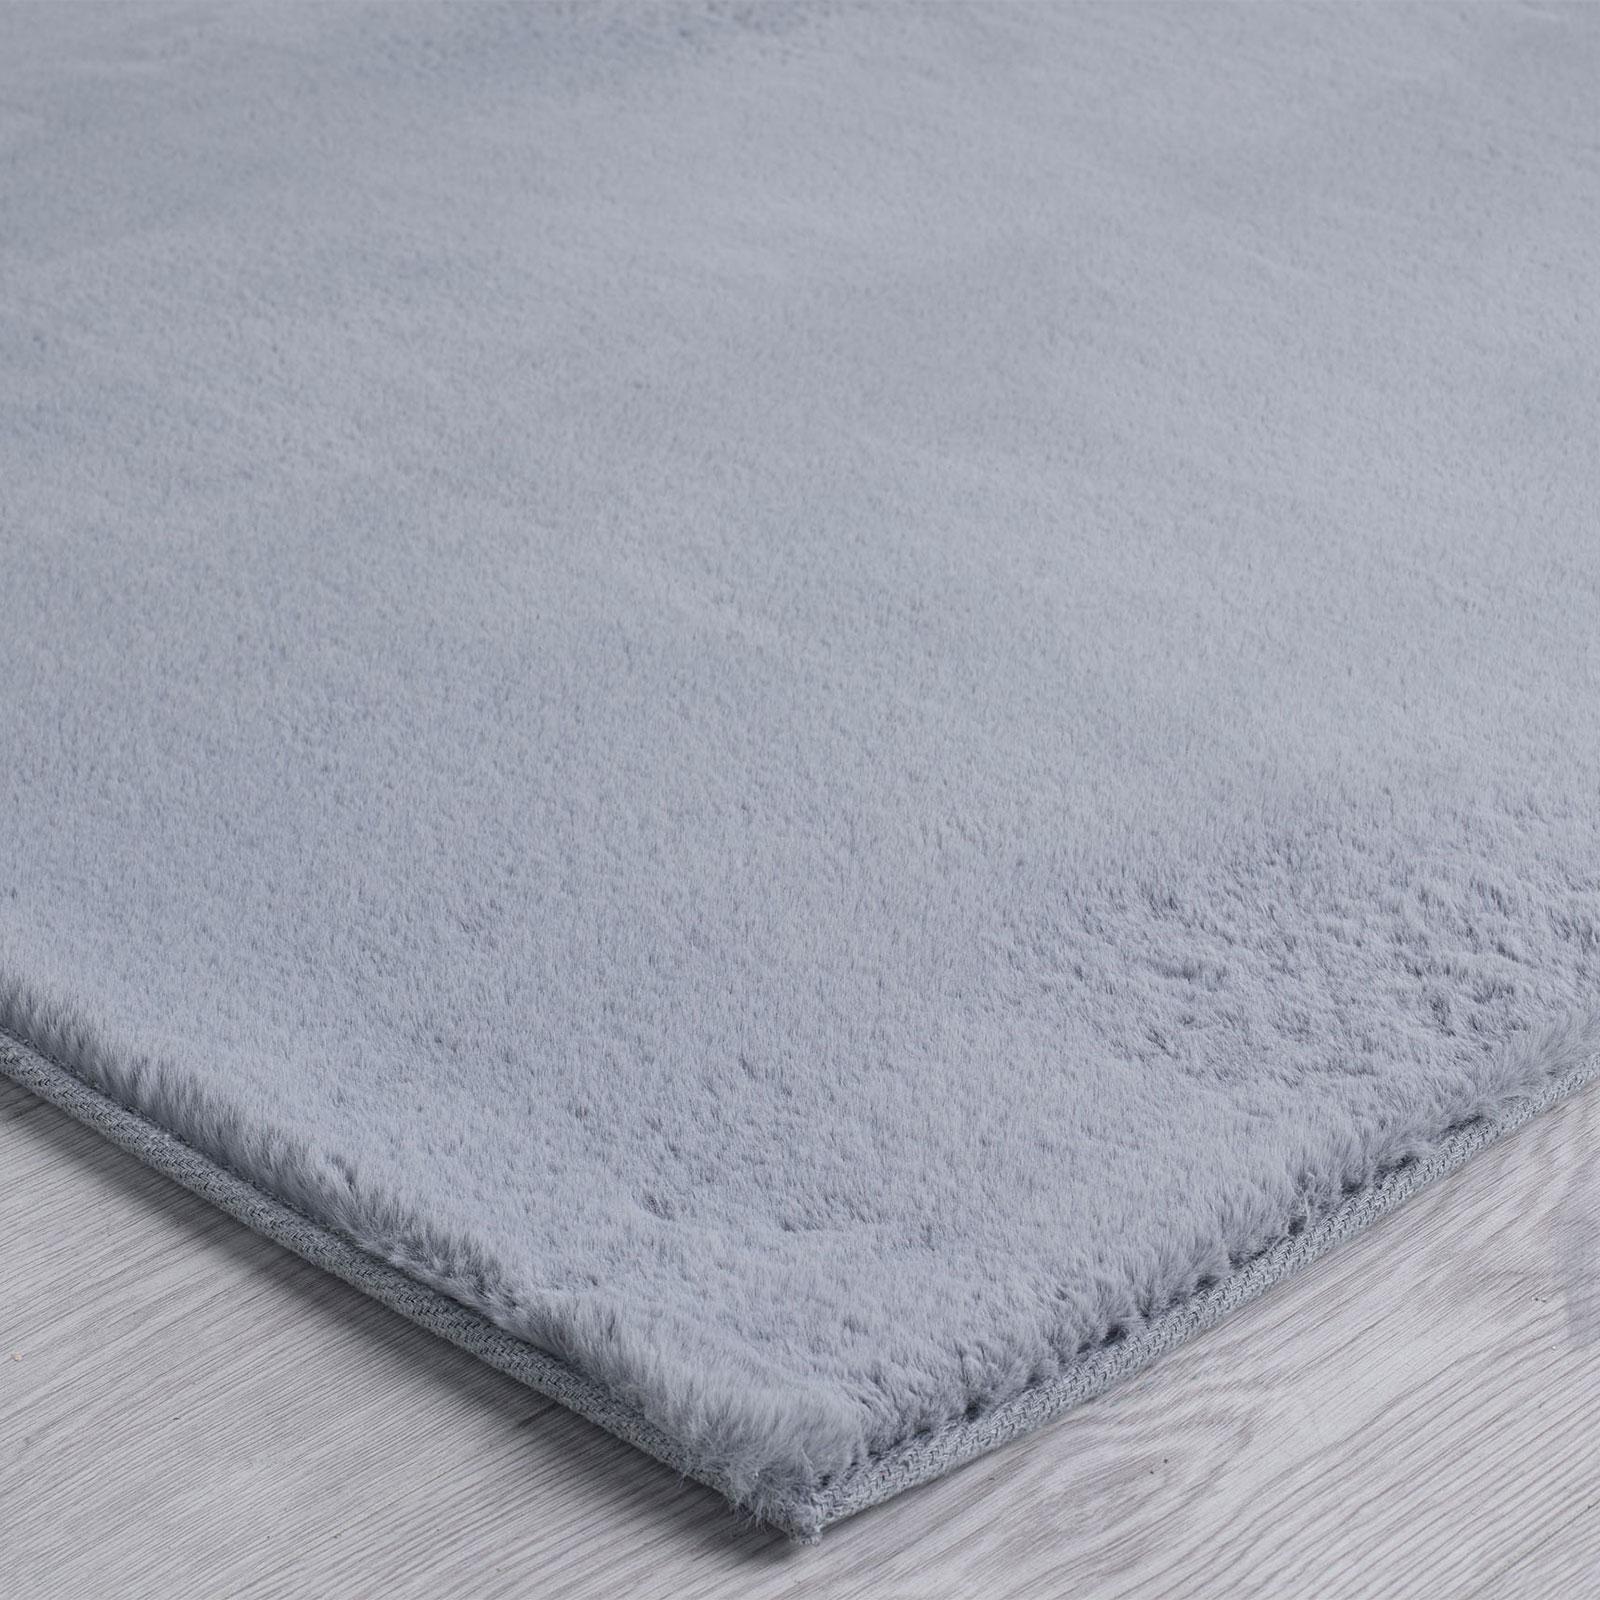 Comfy-Grey-Detail-(1).jpg